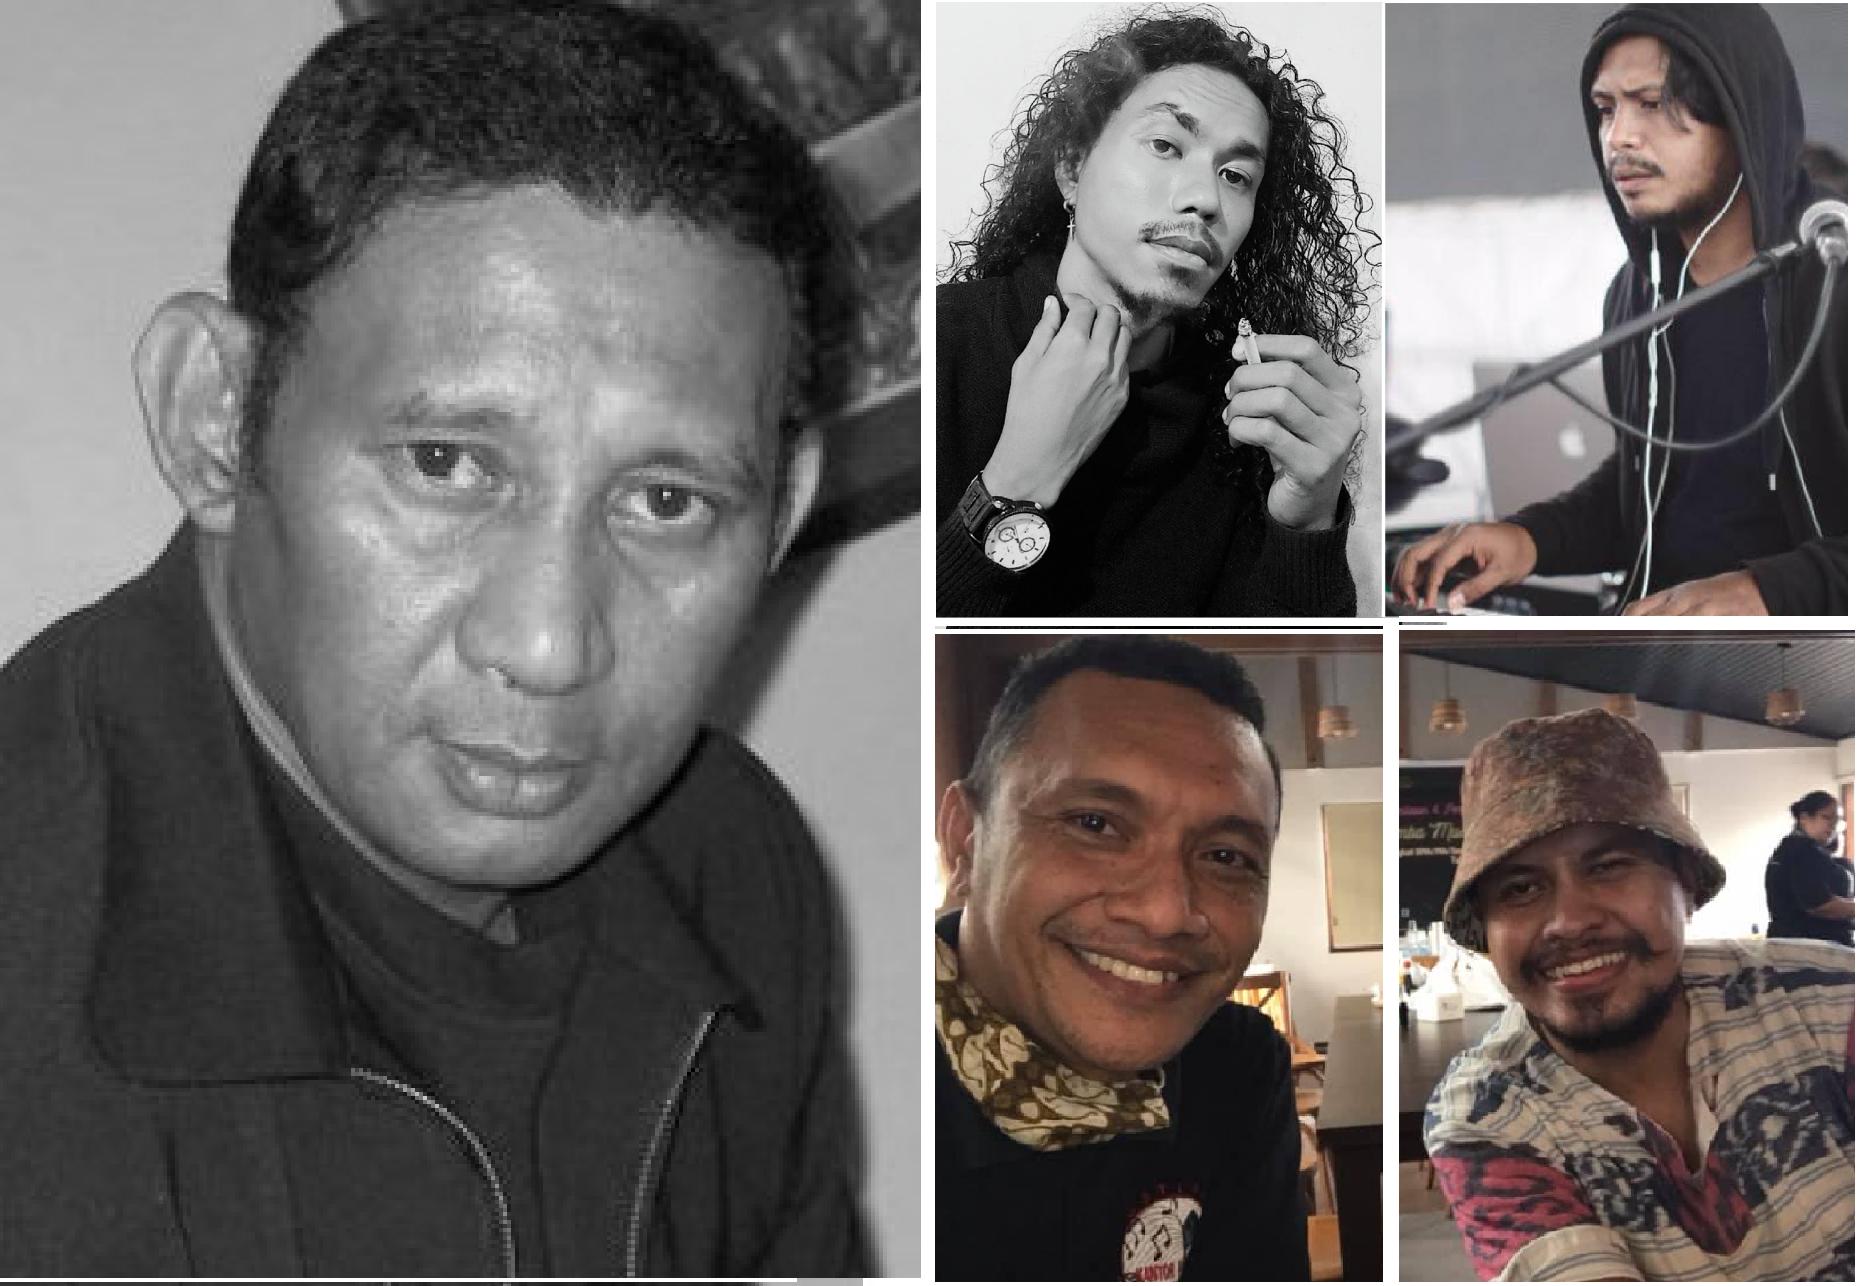 Lima komponis Maluku yang berjaya tahun ini di ajang lomba cipta lagu Pesparawi Nasional: Godlief Soumokil, Henry Marvin Sopaheluwakan, Figgy Papilaya, Falantino Latupapua, dan Igor Sopamena (fofo fb)